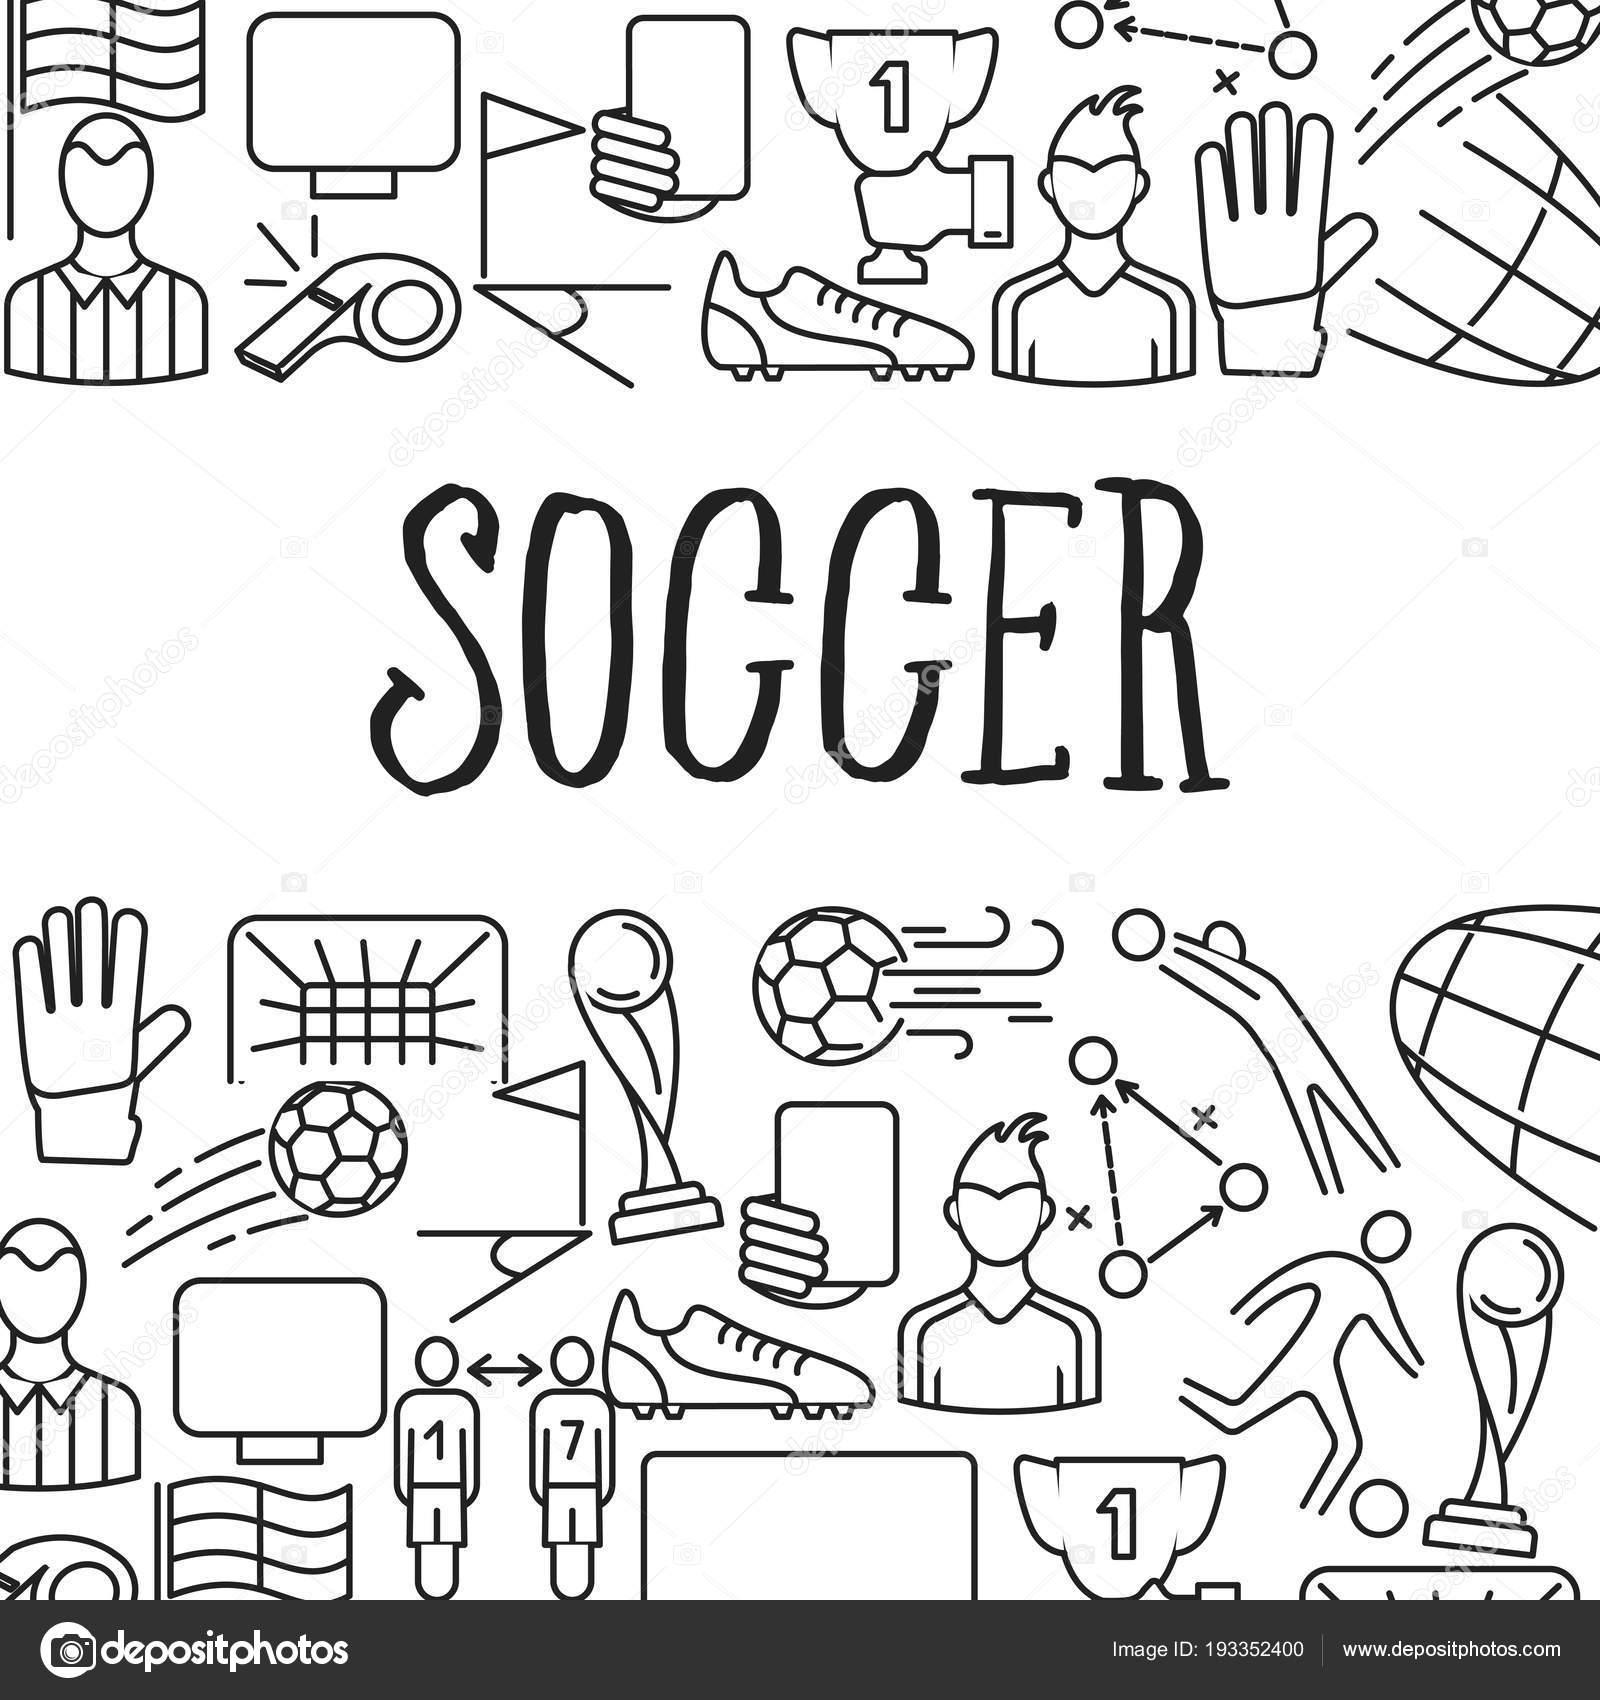 Soccer icons in Frame. — Stock Vector © LuckyVector #193352400